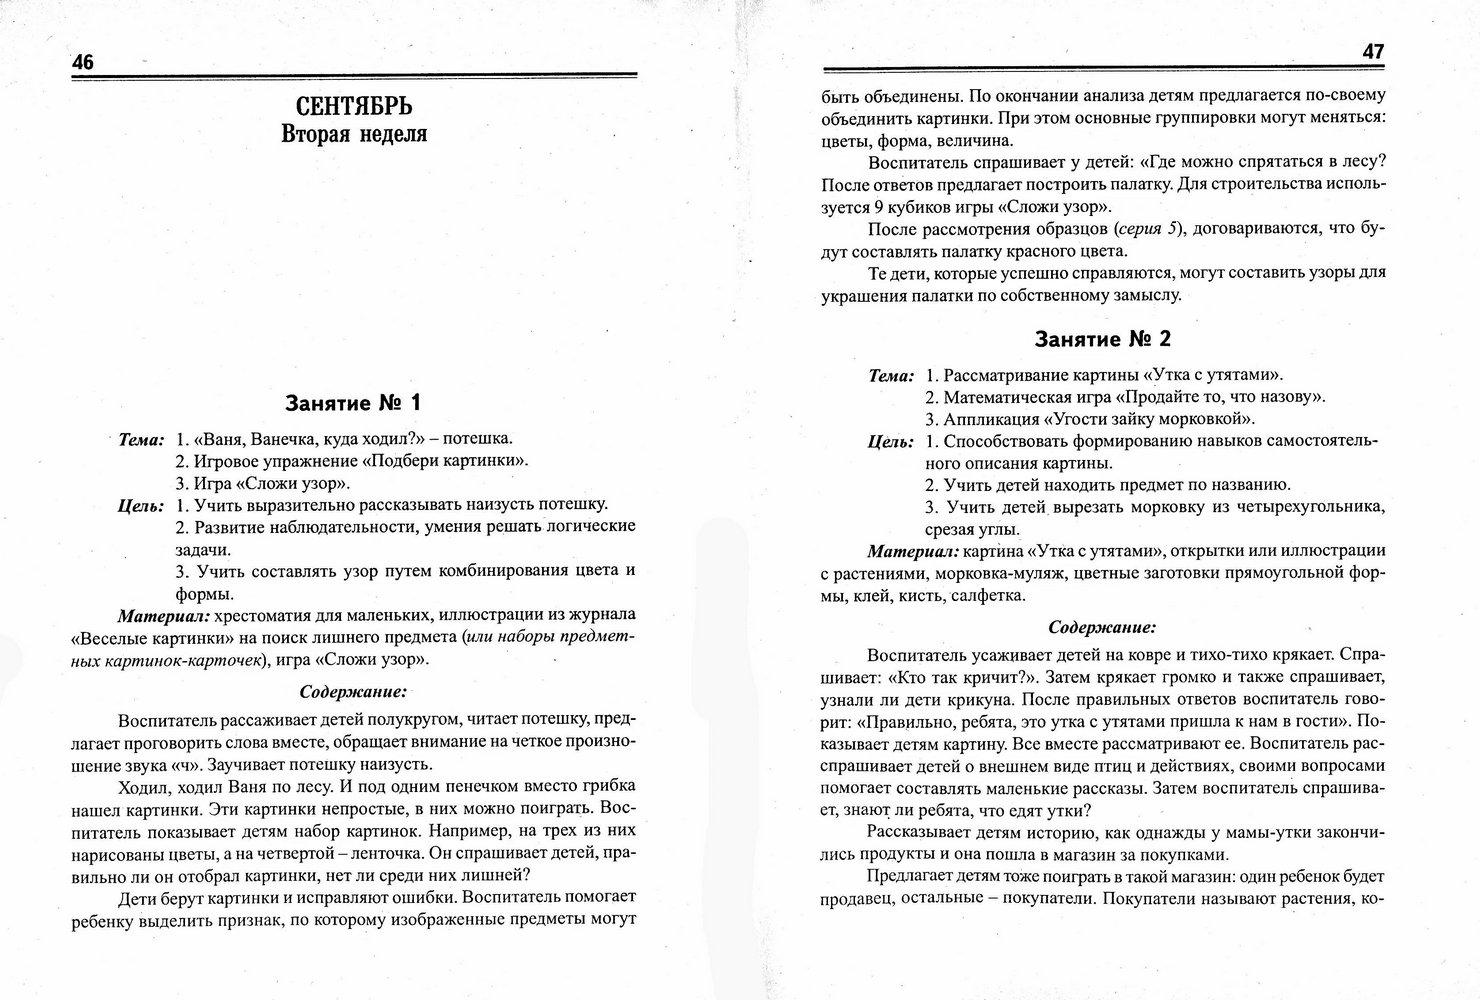 http://images.vfl.ru/ii/1367672072/26a803b8/2276078.jpg